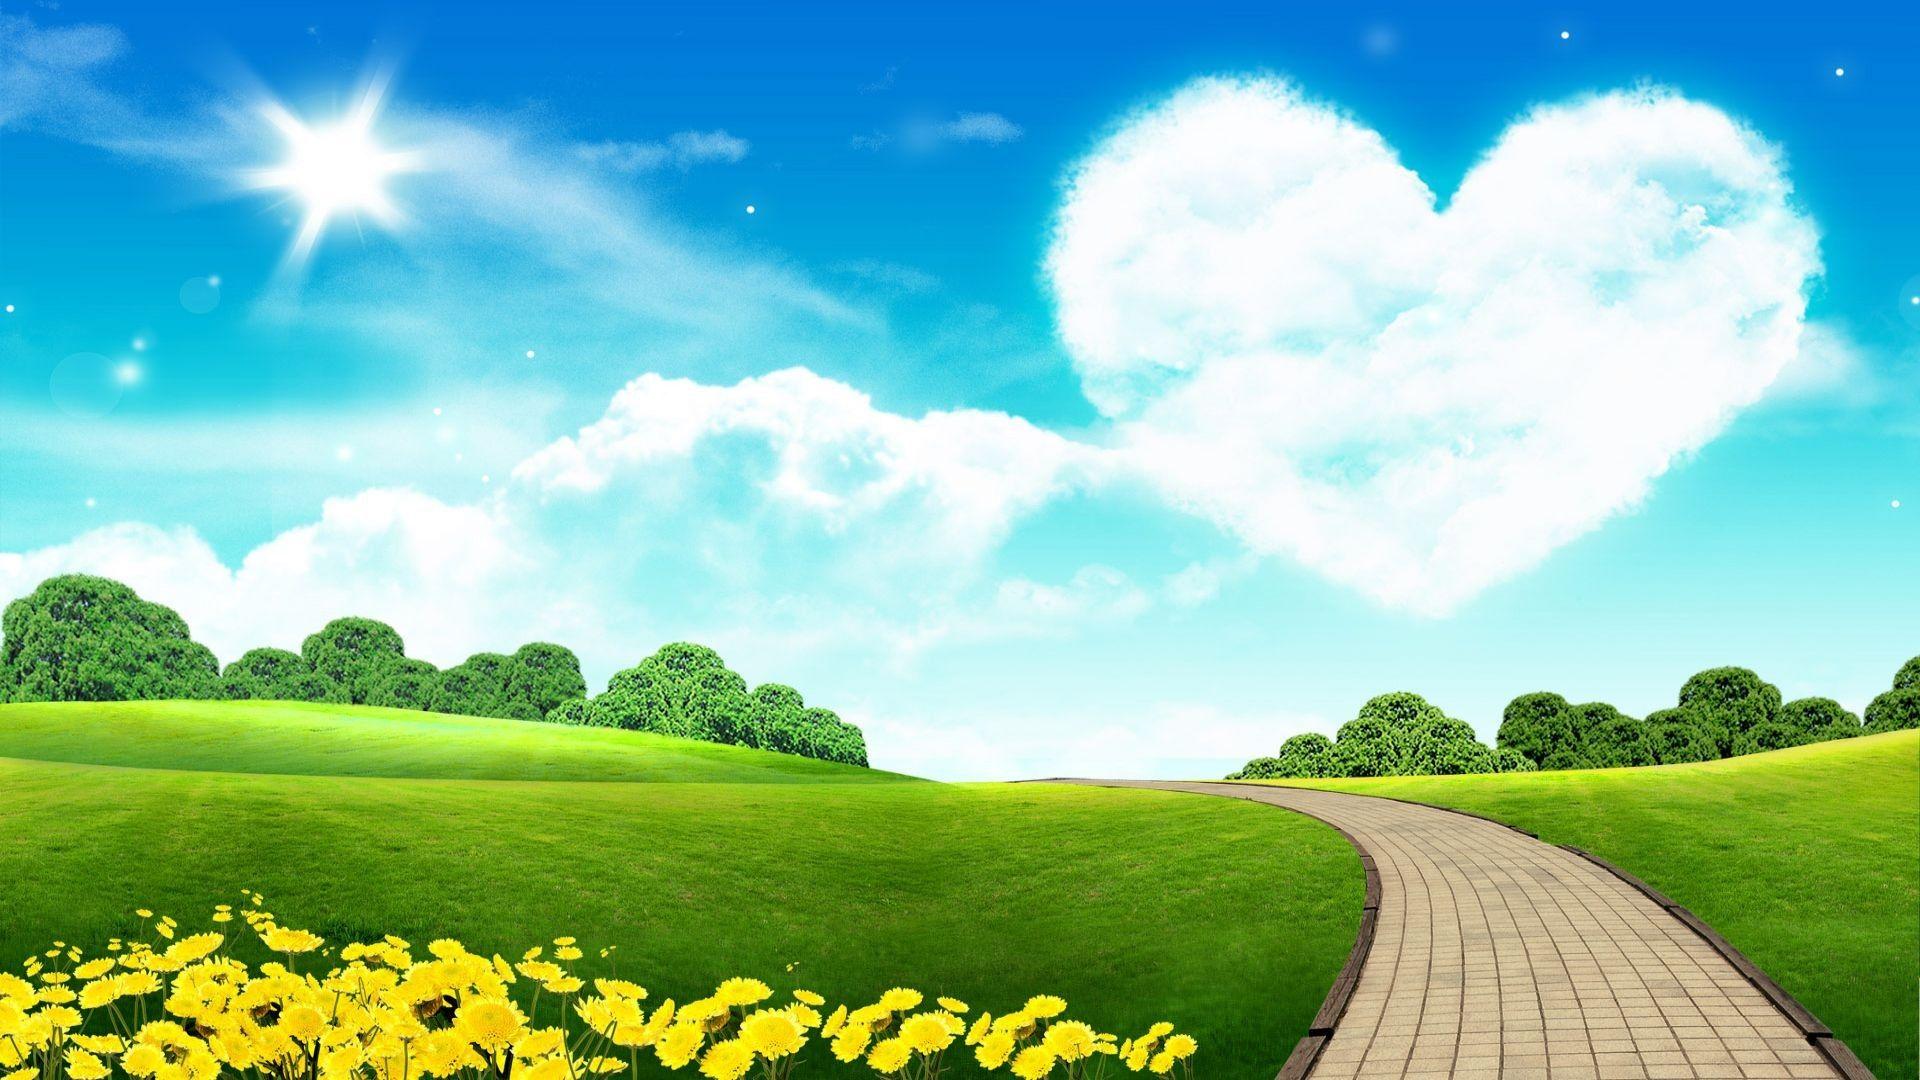 Summer Landscape 1280 215 720 Hd Desktop Hd Wallpaper Stock